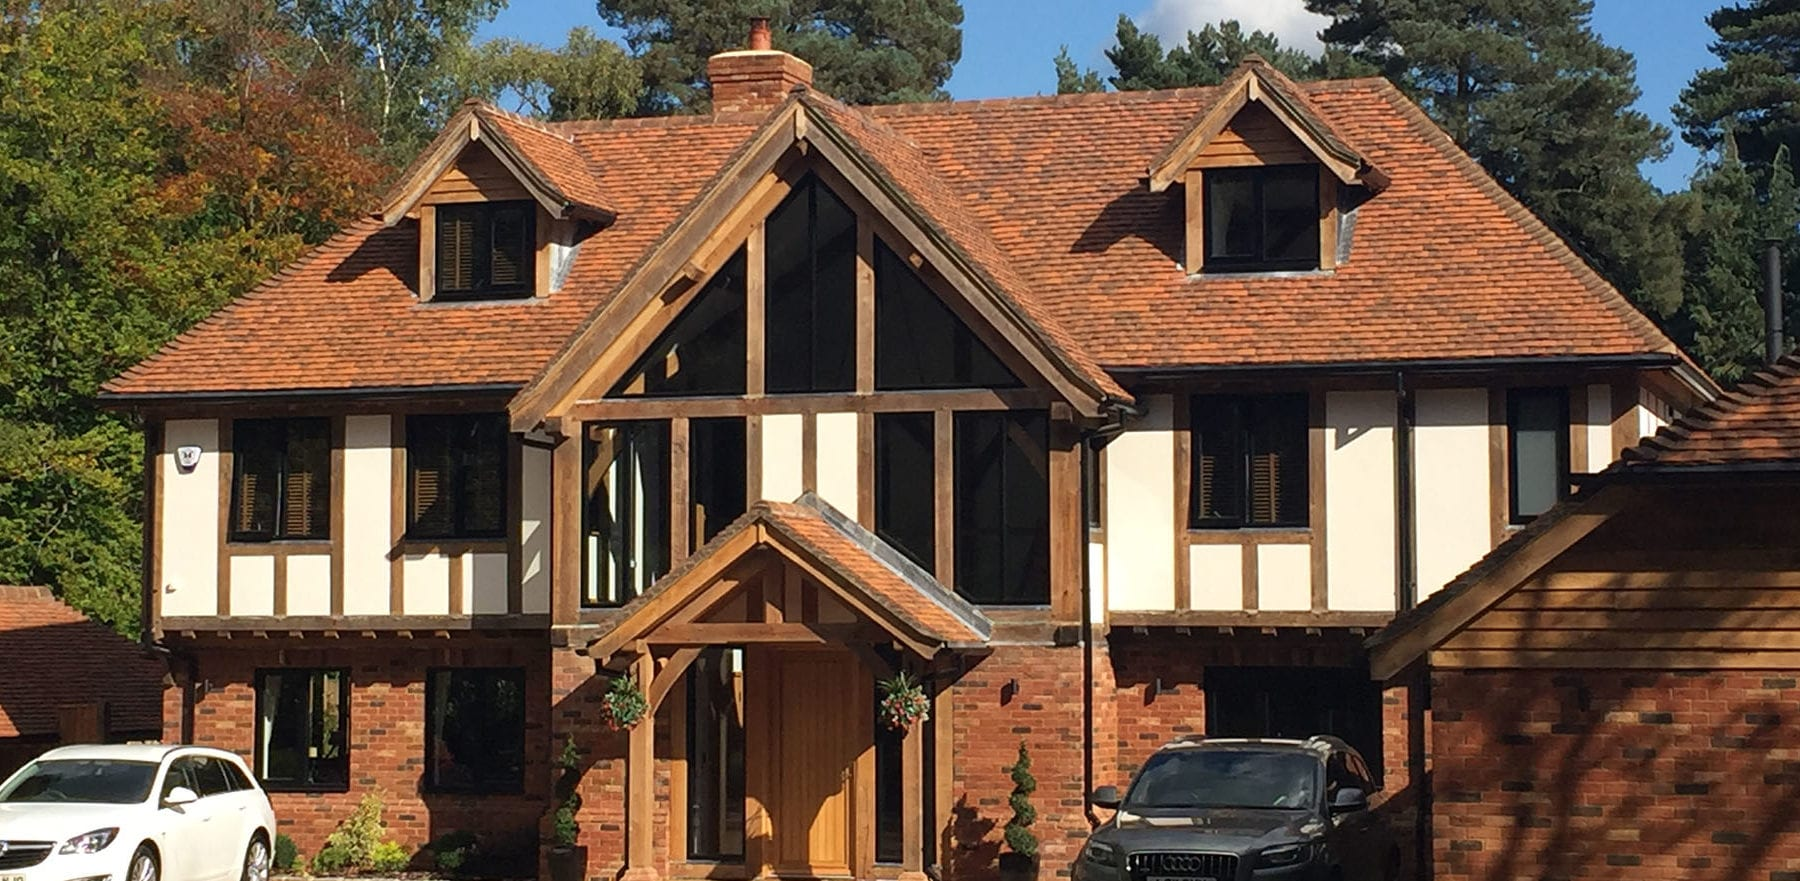 Lifestiles - Handmade Berkshire Clay Roof Tiles - Crowthorne, England 2